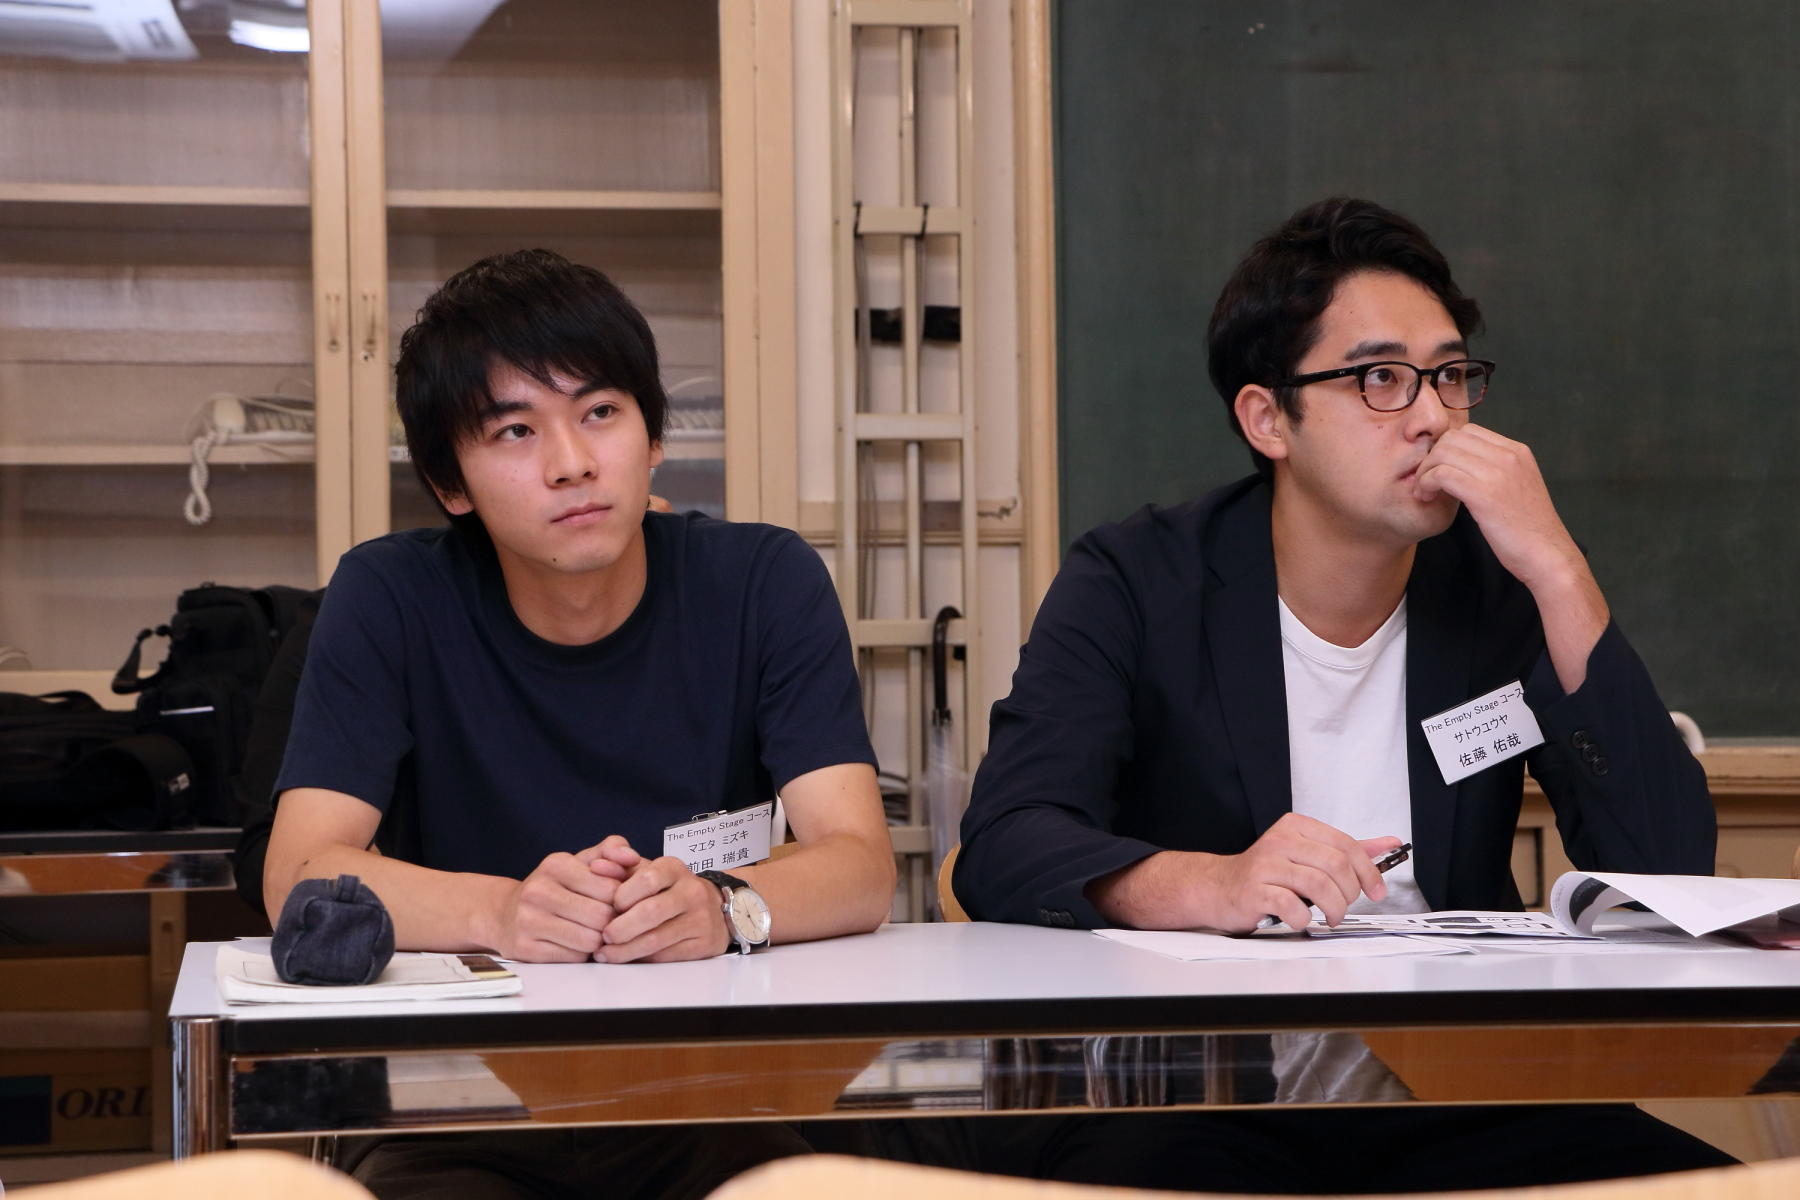 http://news.yoshimoto.co.jp/20170910063928-6fcccfade5d6e1faed7cc0d0a4f3c4442d9a3b62.jpg